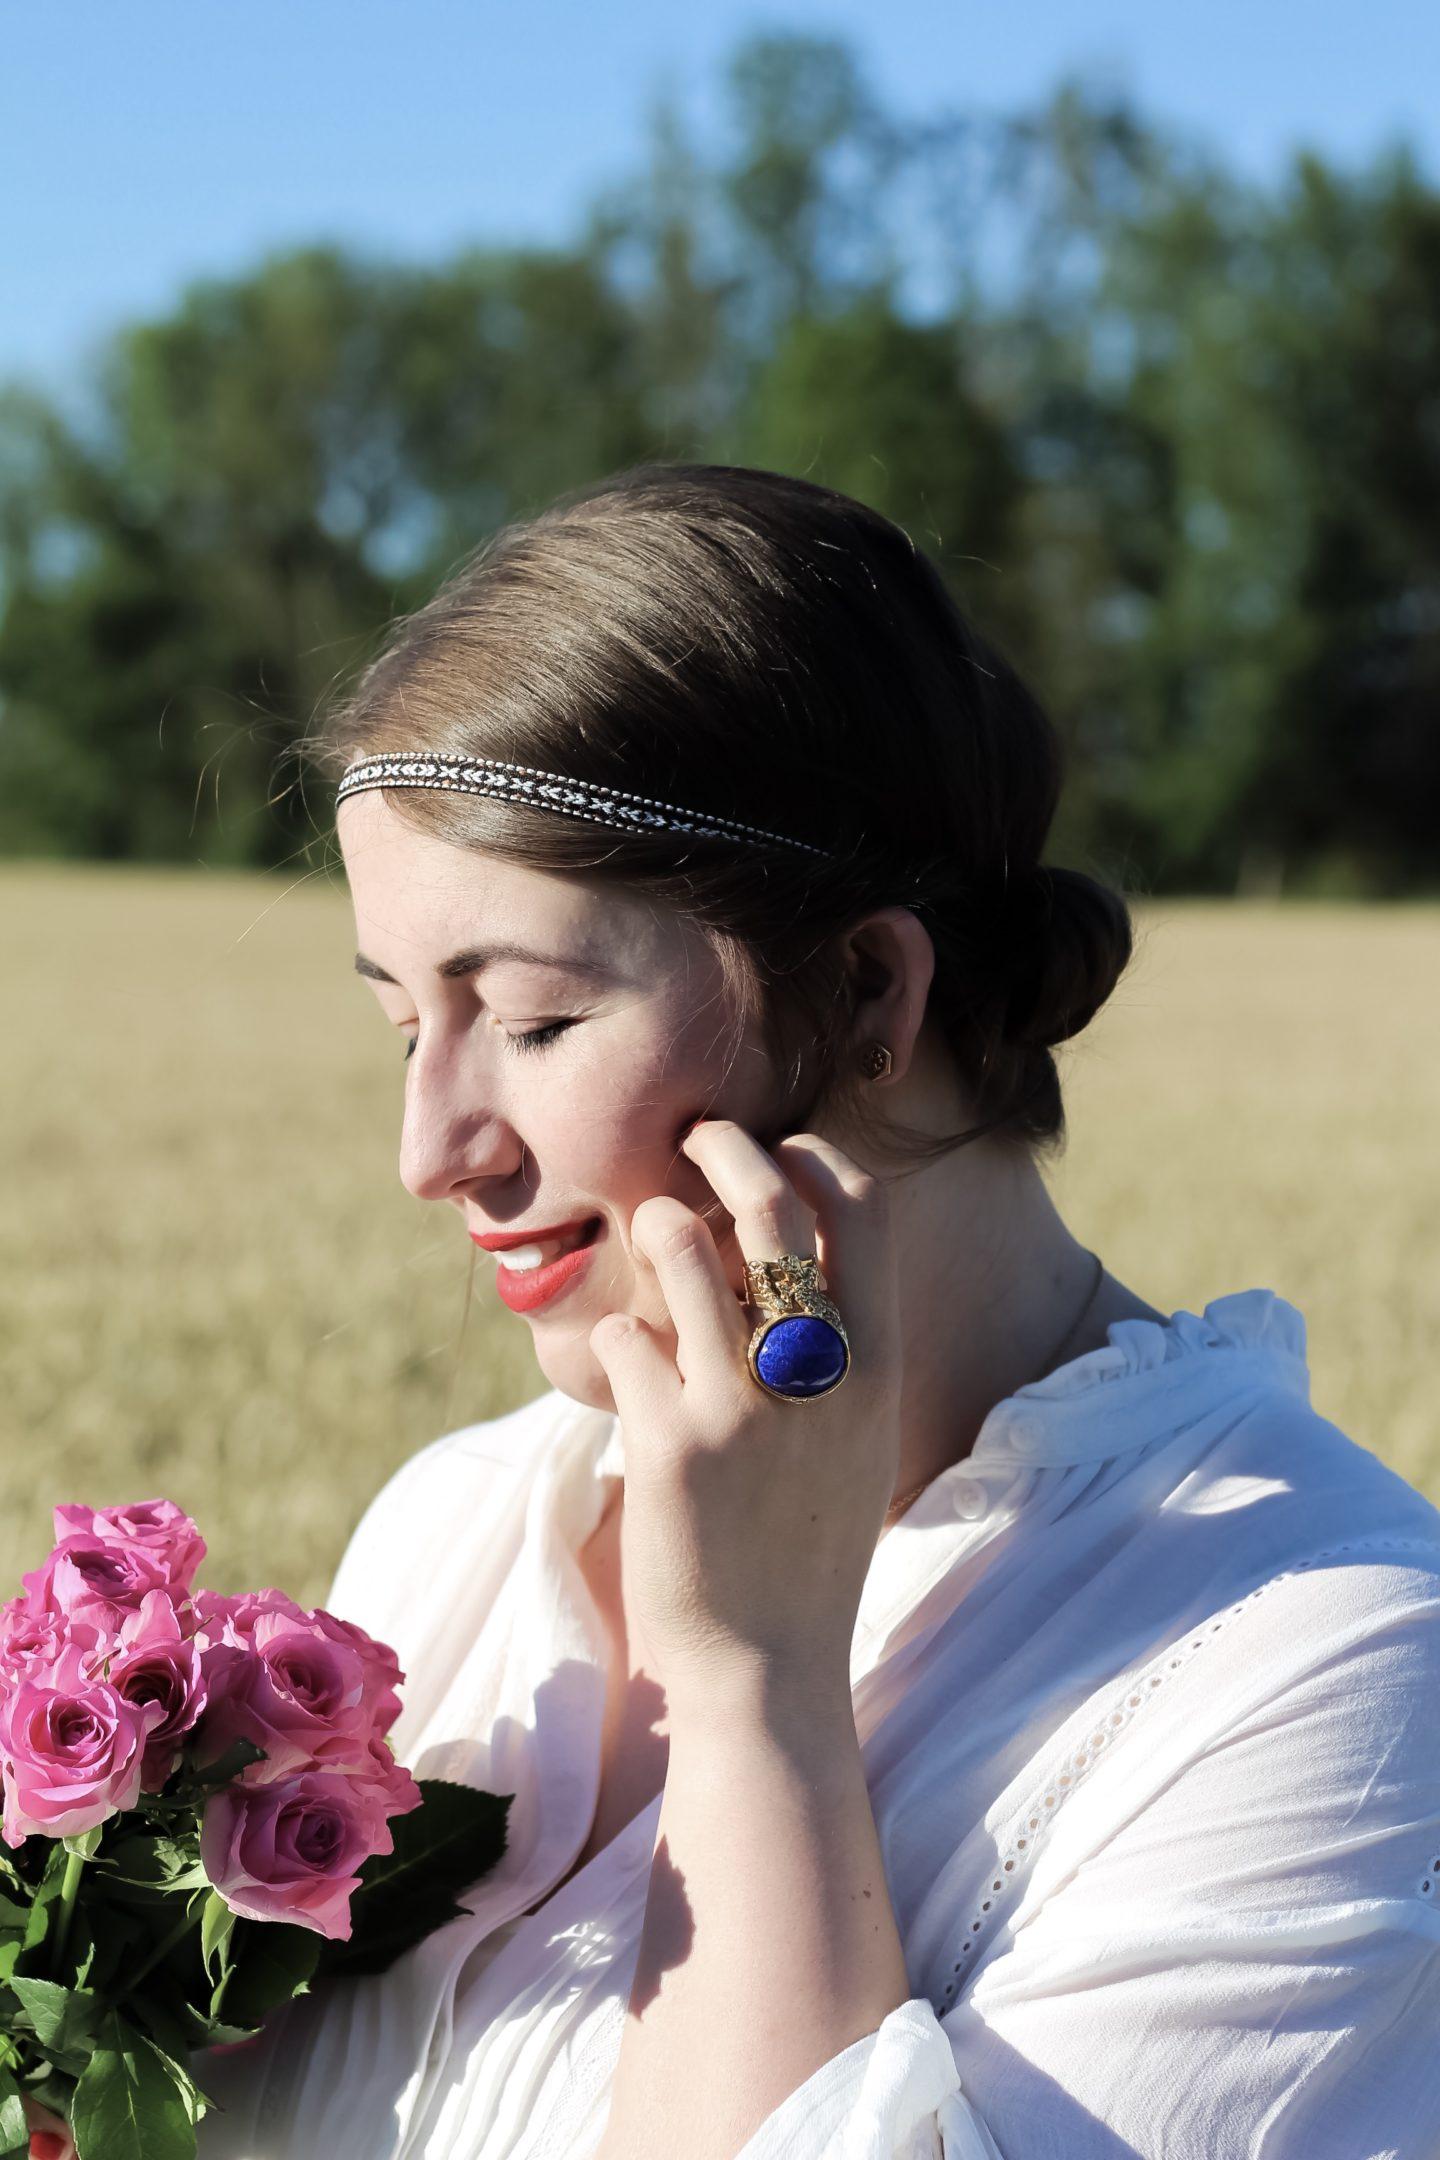 Miss-Suzie-Loves-Festival-Frisuren-feines-Haar-Hippie-Boho-Stirnband-Haarband-YSL-Ring-Arty-Rosen-Weizenfeld-Susanne-Heidebach-Fashionblogger